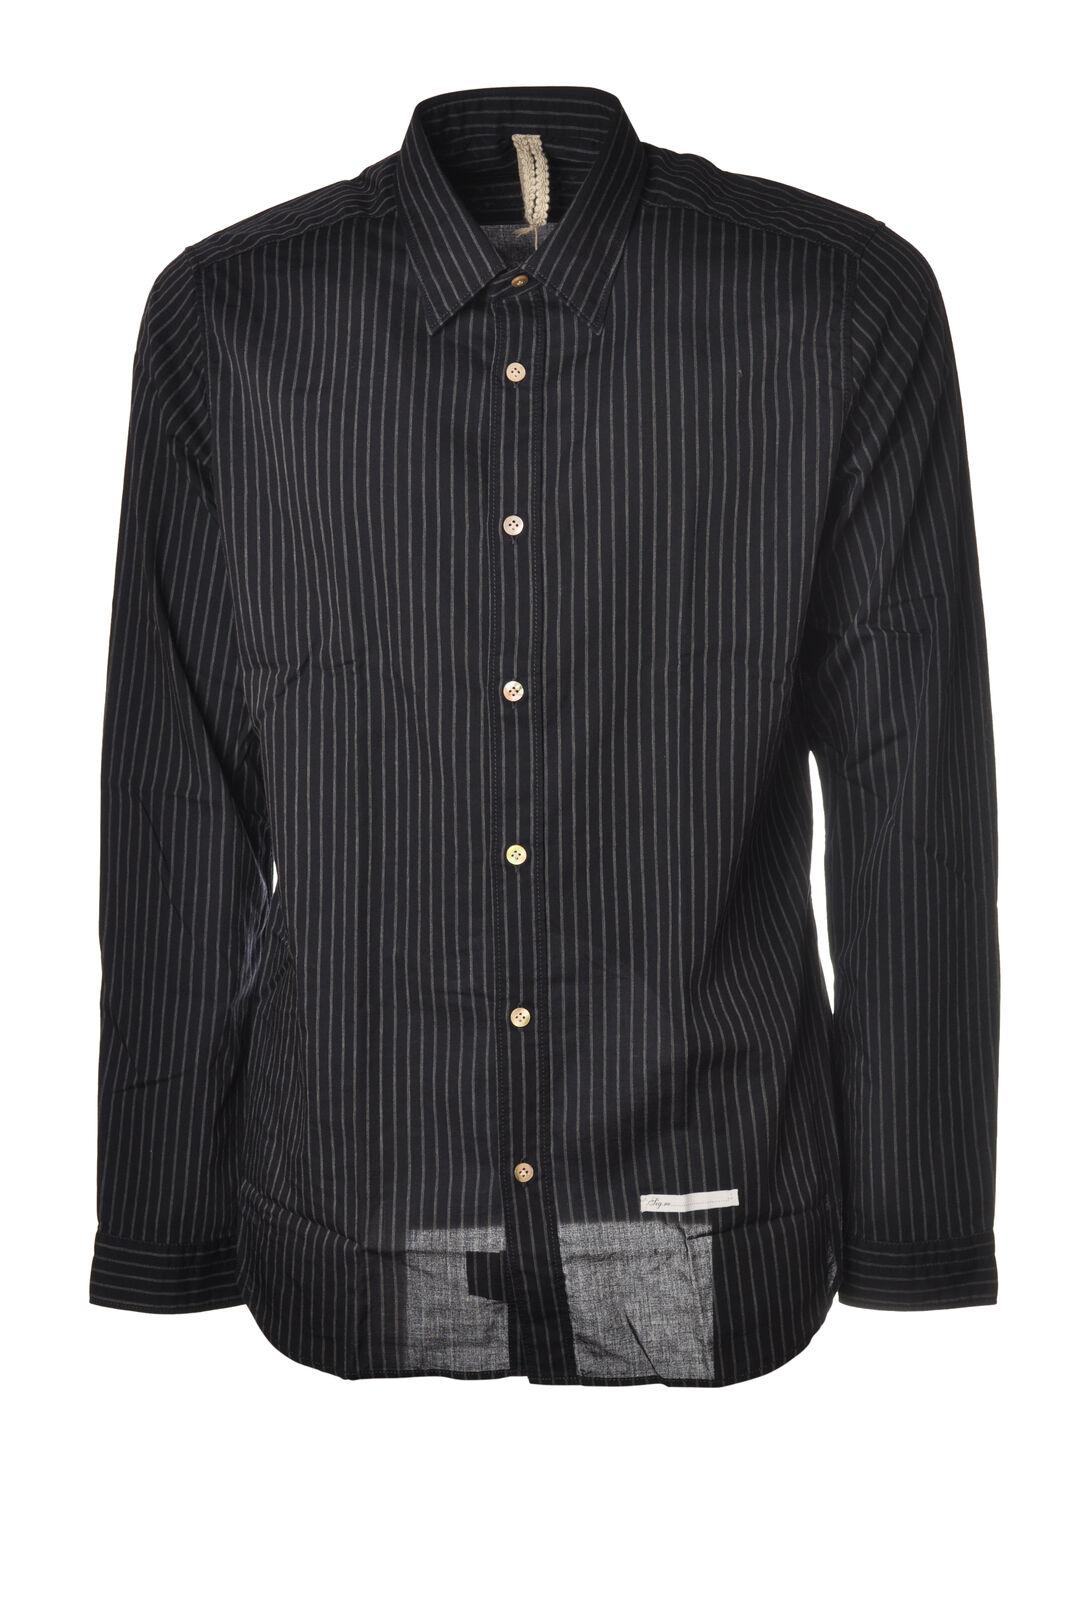 Dnl - Shirts-Shirt - Man - Blau - 5632309L184553